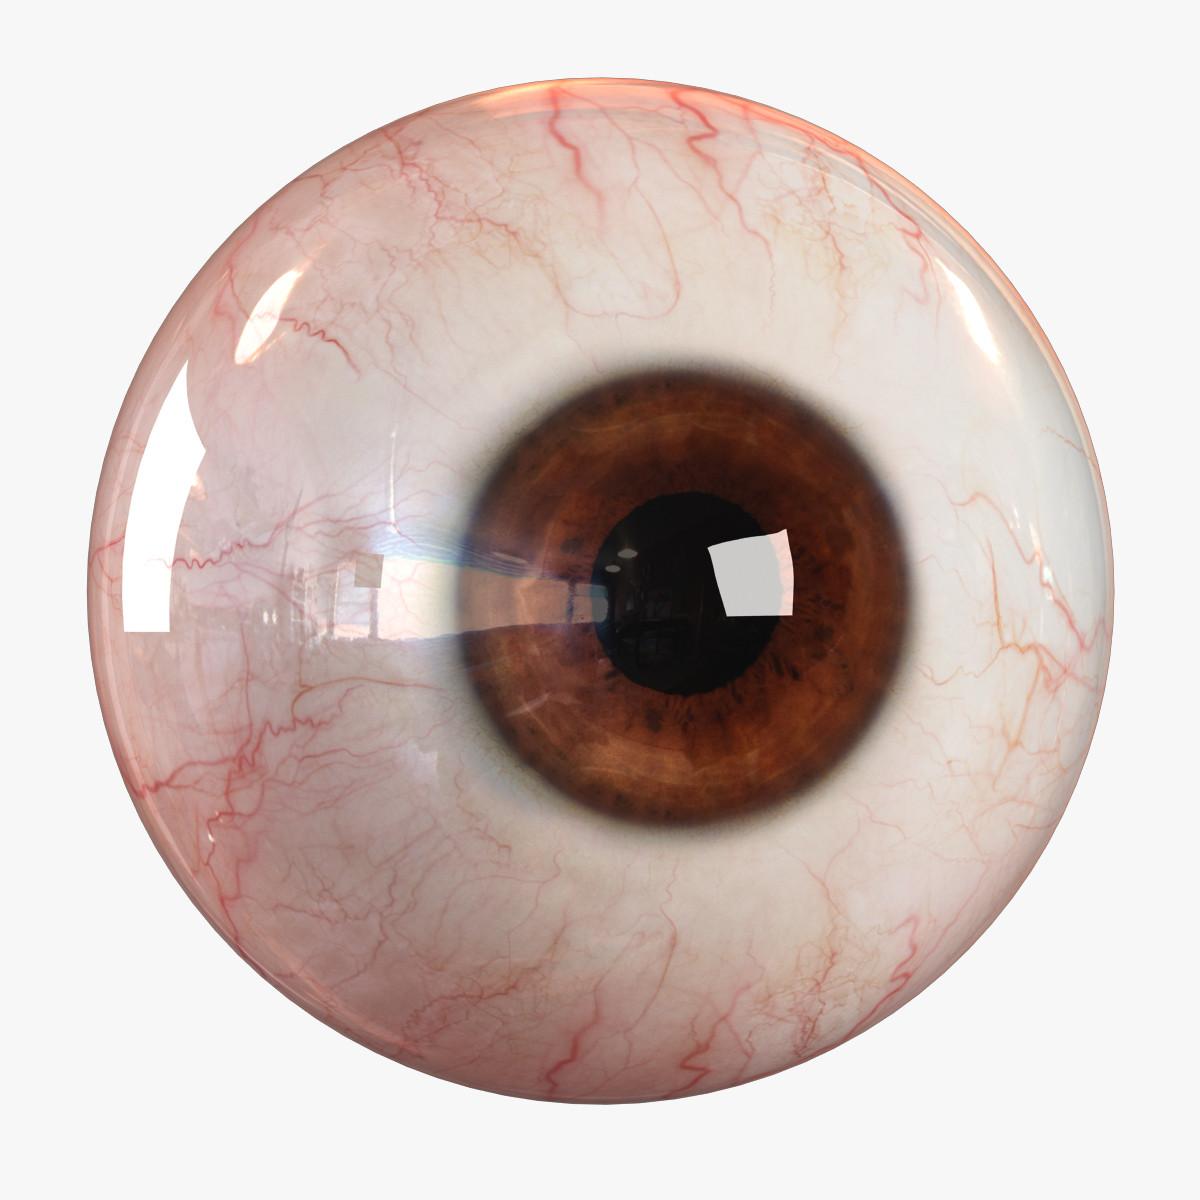 realistic human eye 3d obj: turbosquid.com/3d-models/realistic-human-eye---3d-model/824584